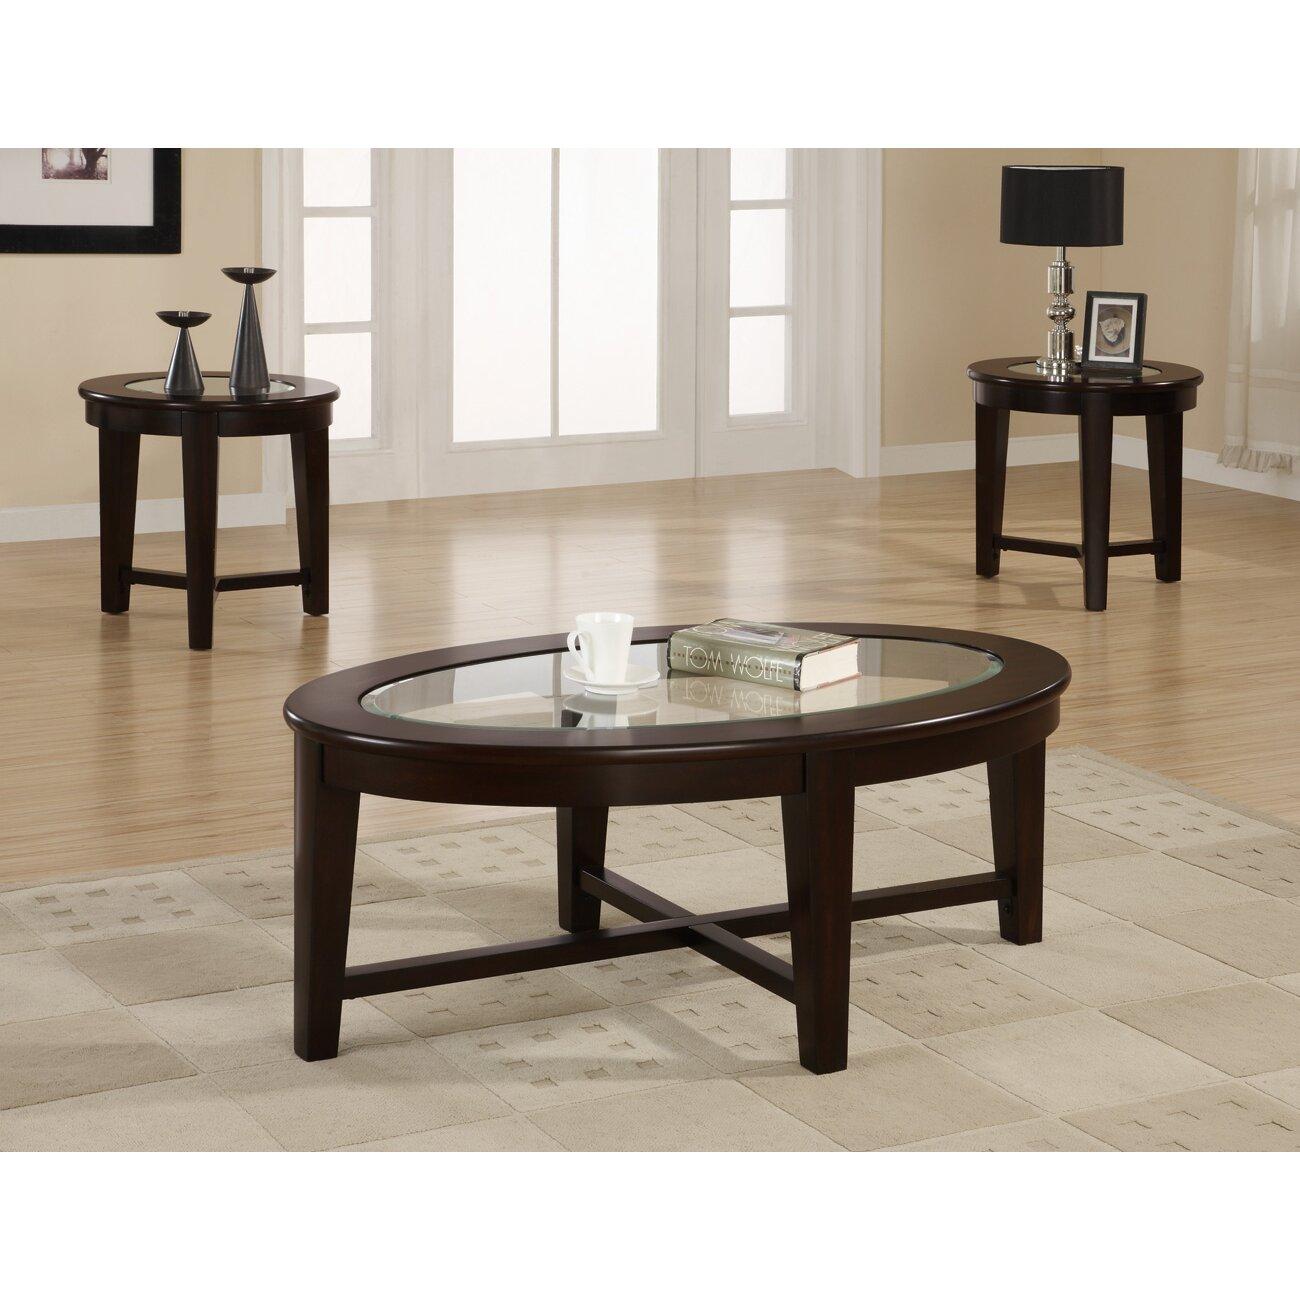 Three Piece Living Room Table Set Wildon Home Ar Amalga 3 Piece Coffee Table Set Reviews Wayfair